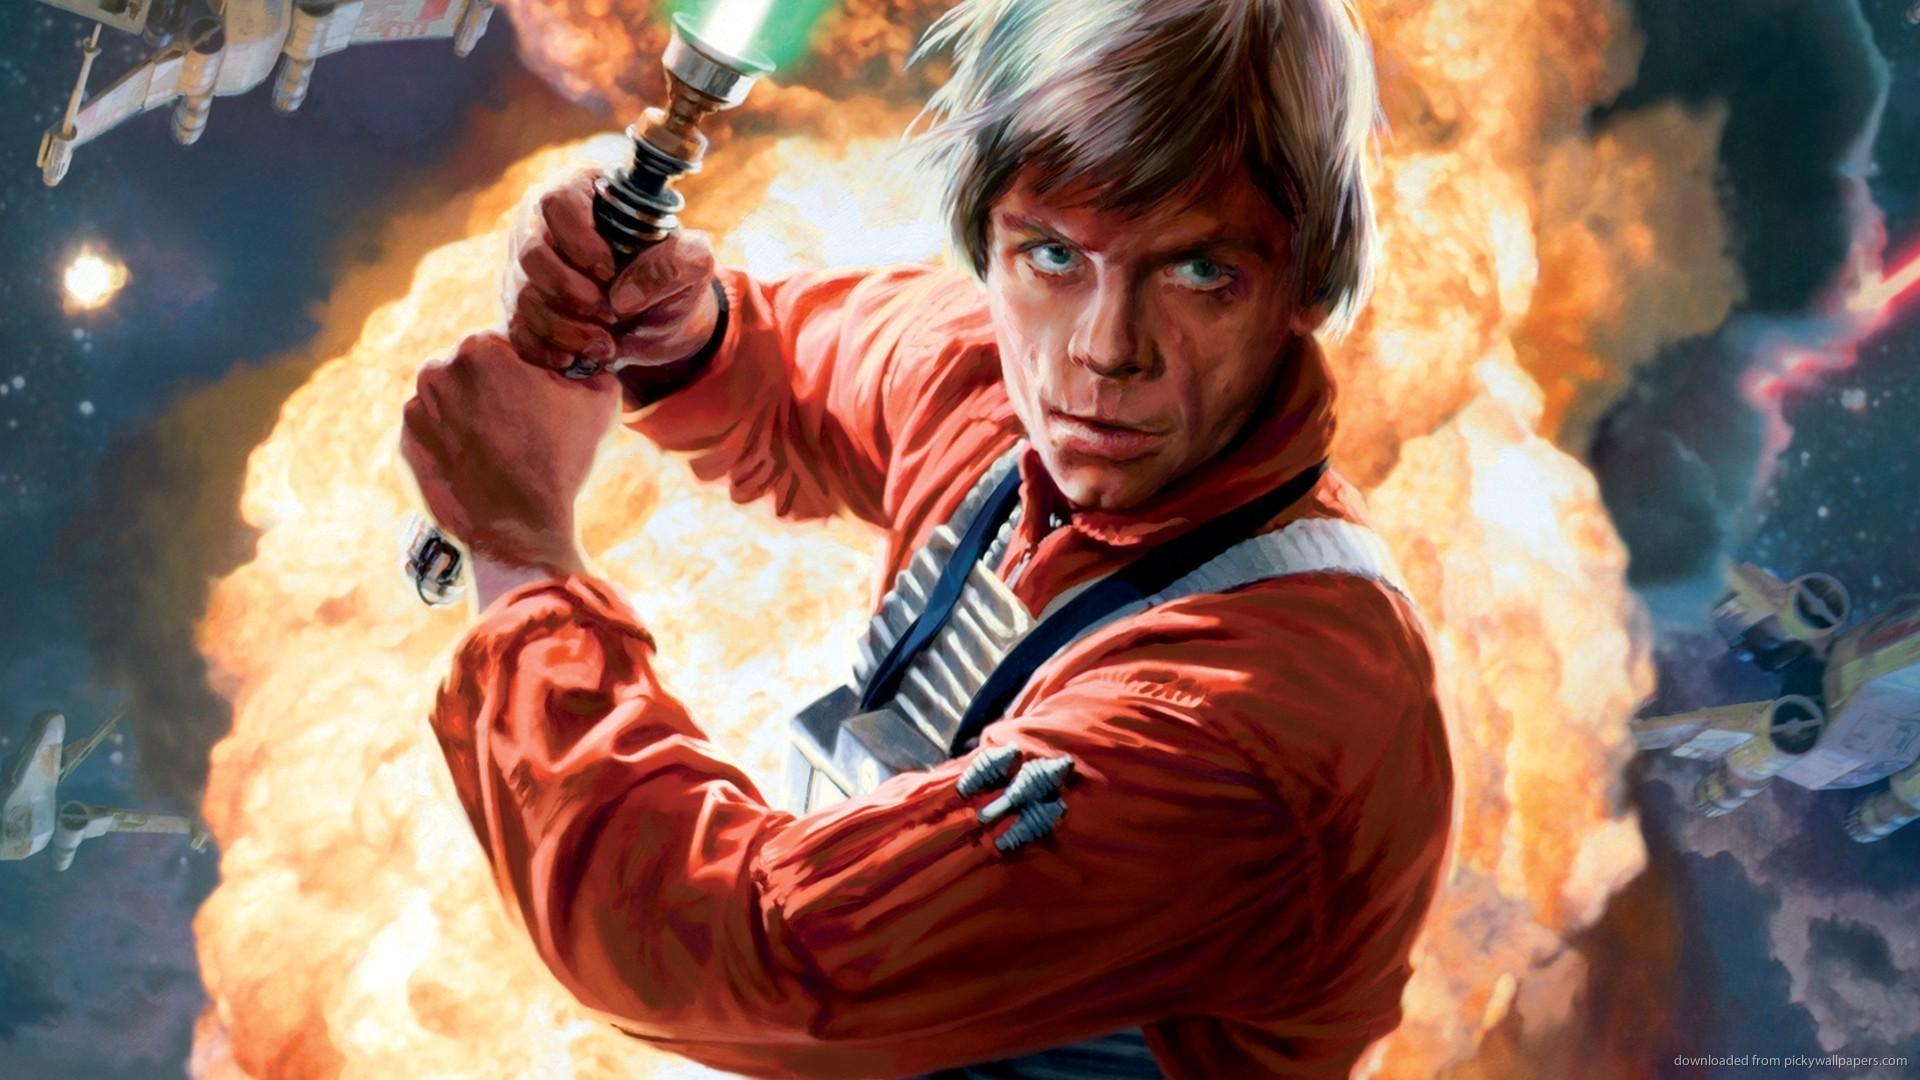 Luke Skywalker Wallpaper Download Free Awesome High Resolution